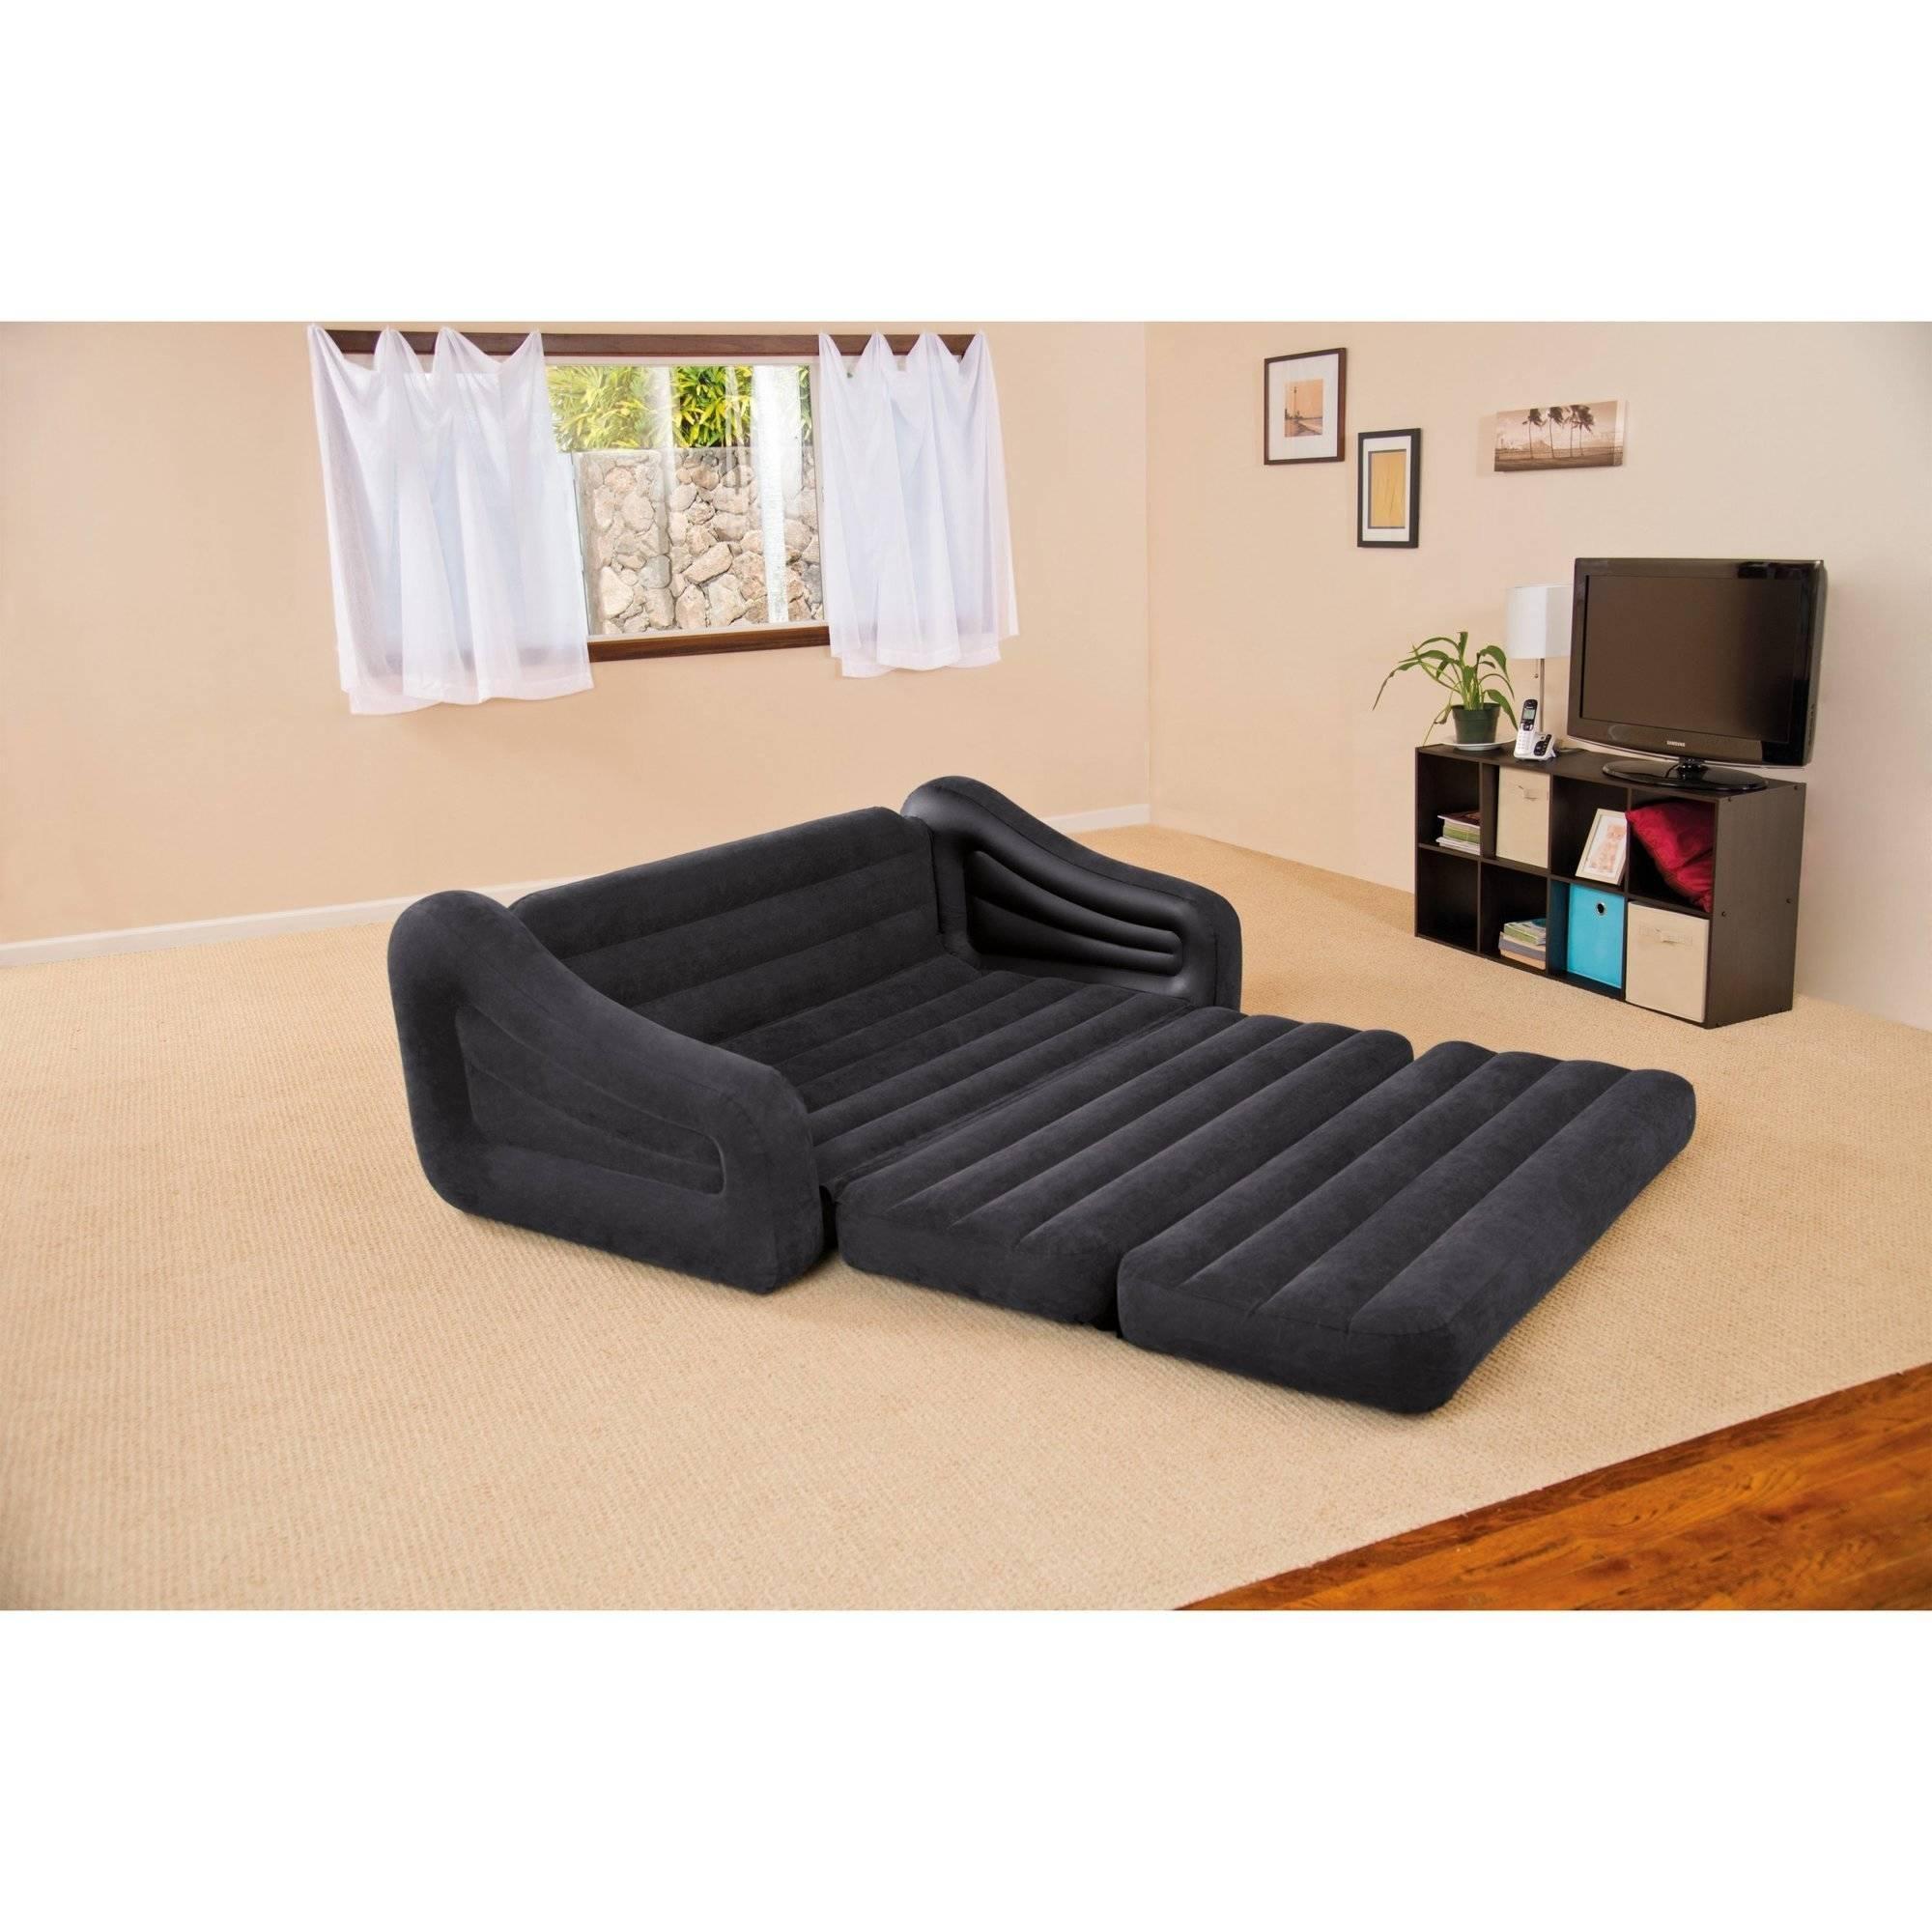 intex ultra lounge chair and ottoman ethan allen wicker 2019 latest air couches sofa ideas